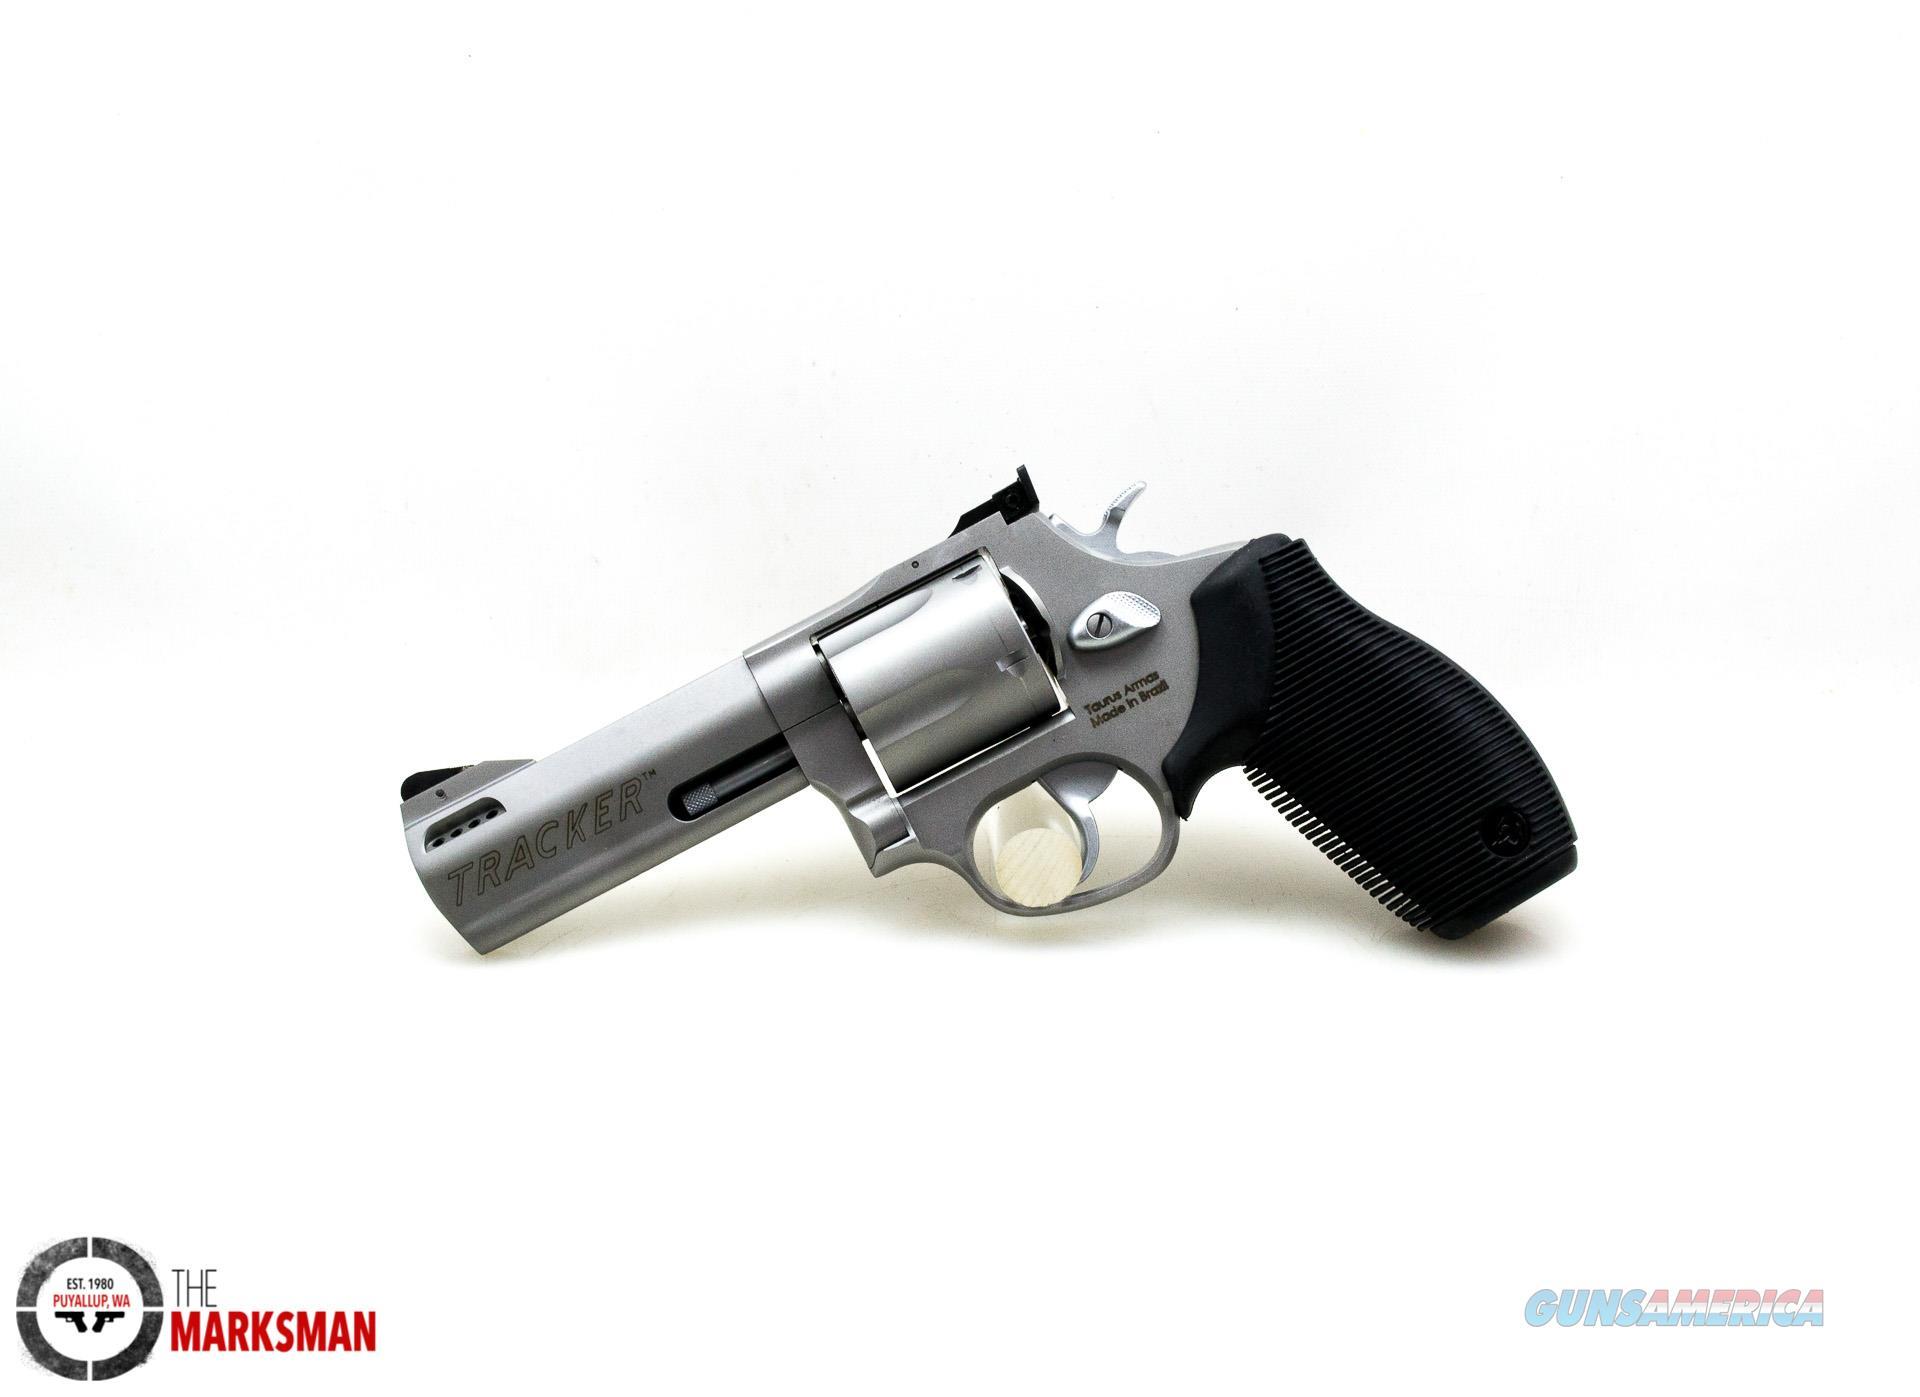 "Taurus Model 44 Tracker, .44 Magnum, Stainless NEW 4""  Guns > Pistols > Taurus Pistols > Revolvers"